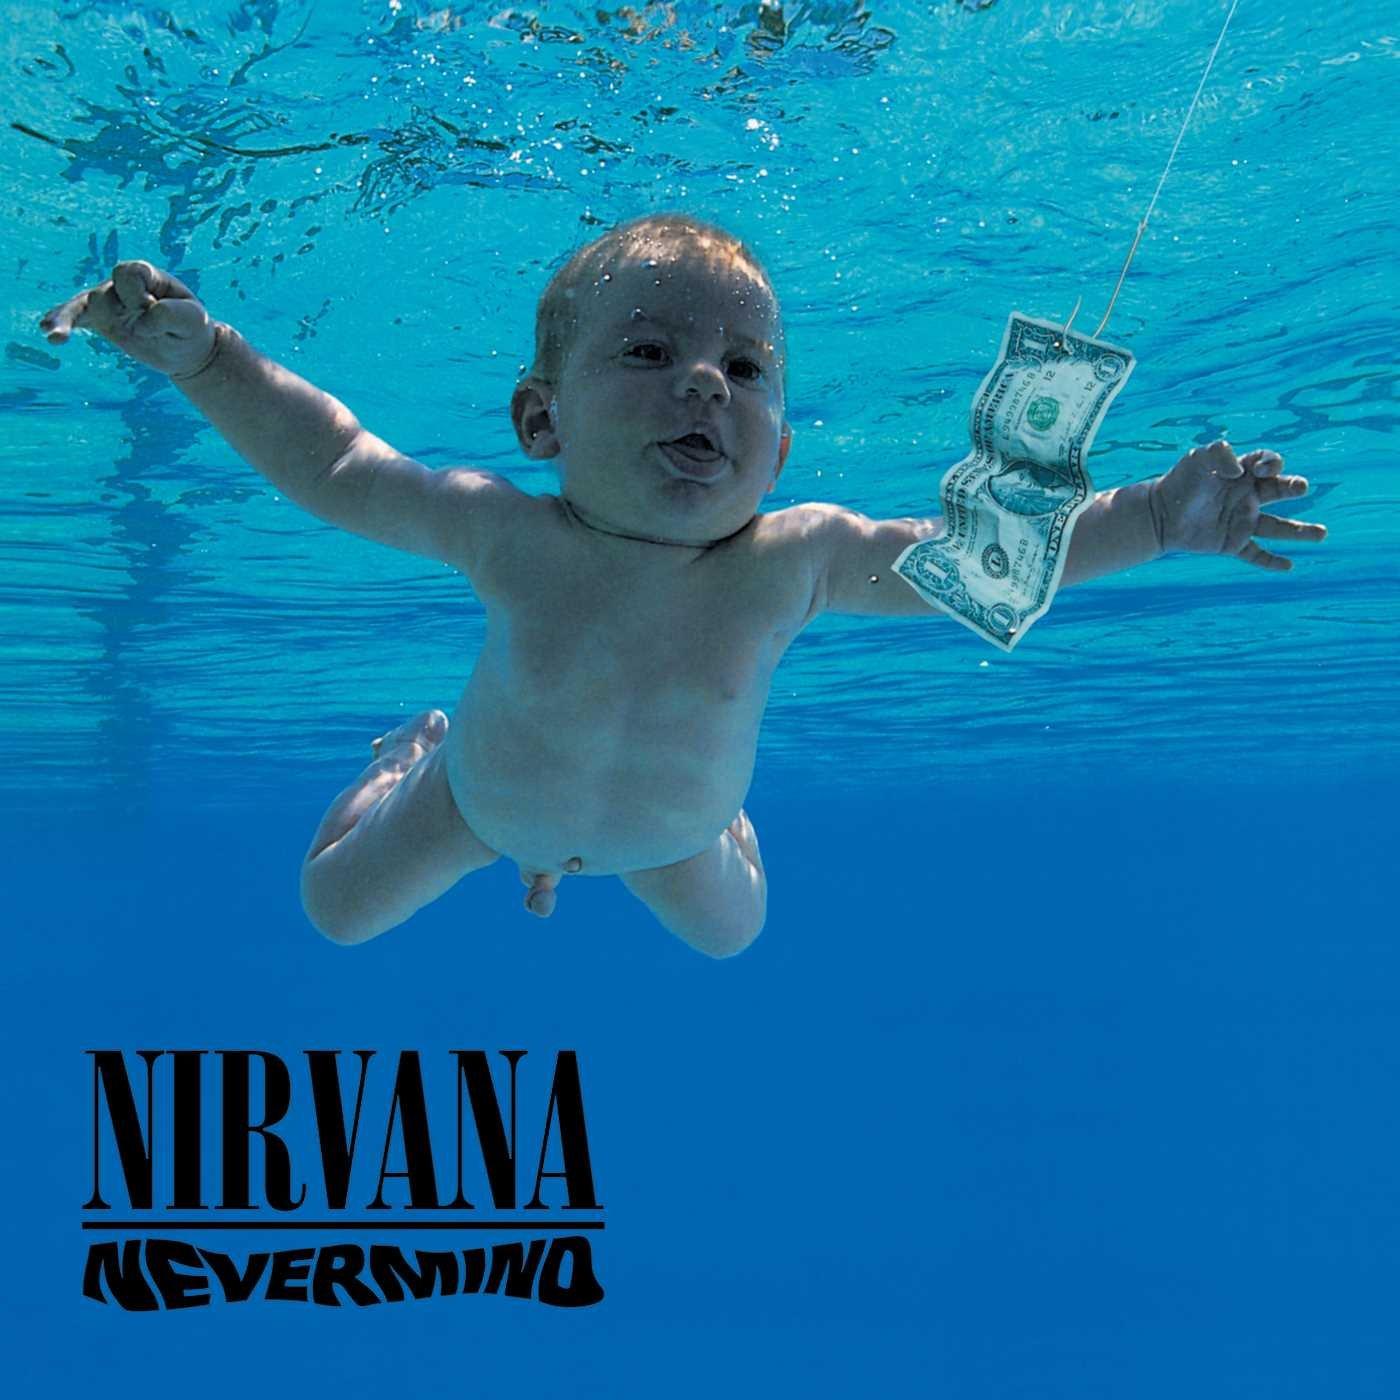 Nirvana Nervermind